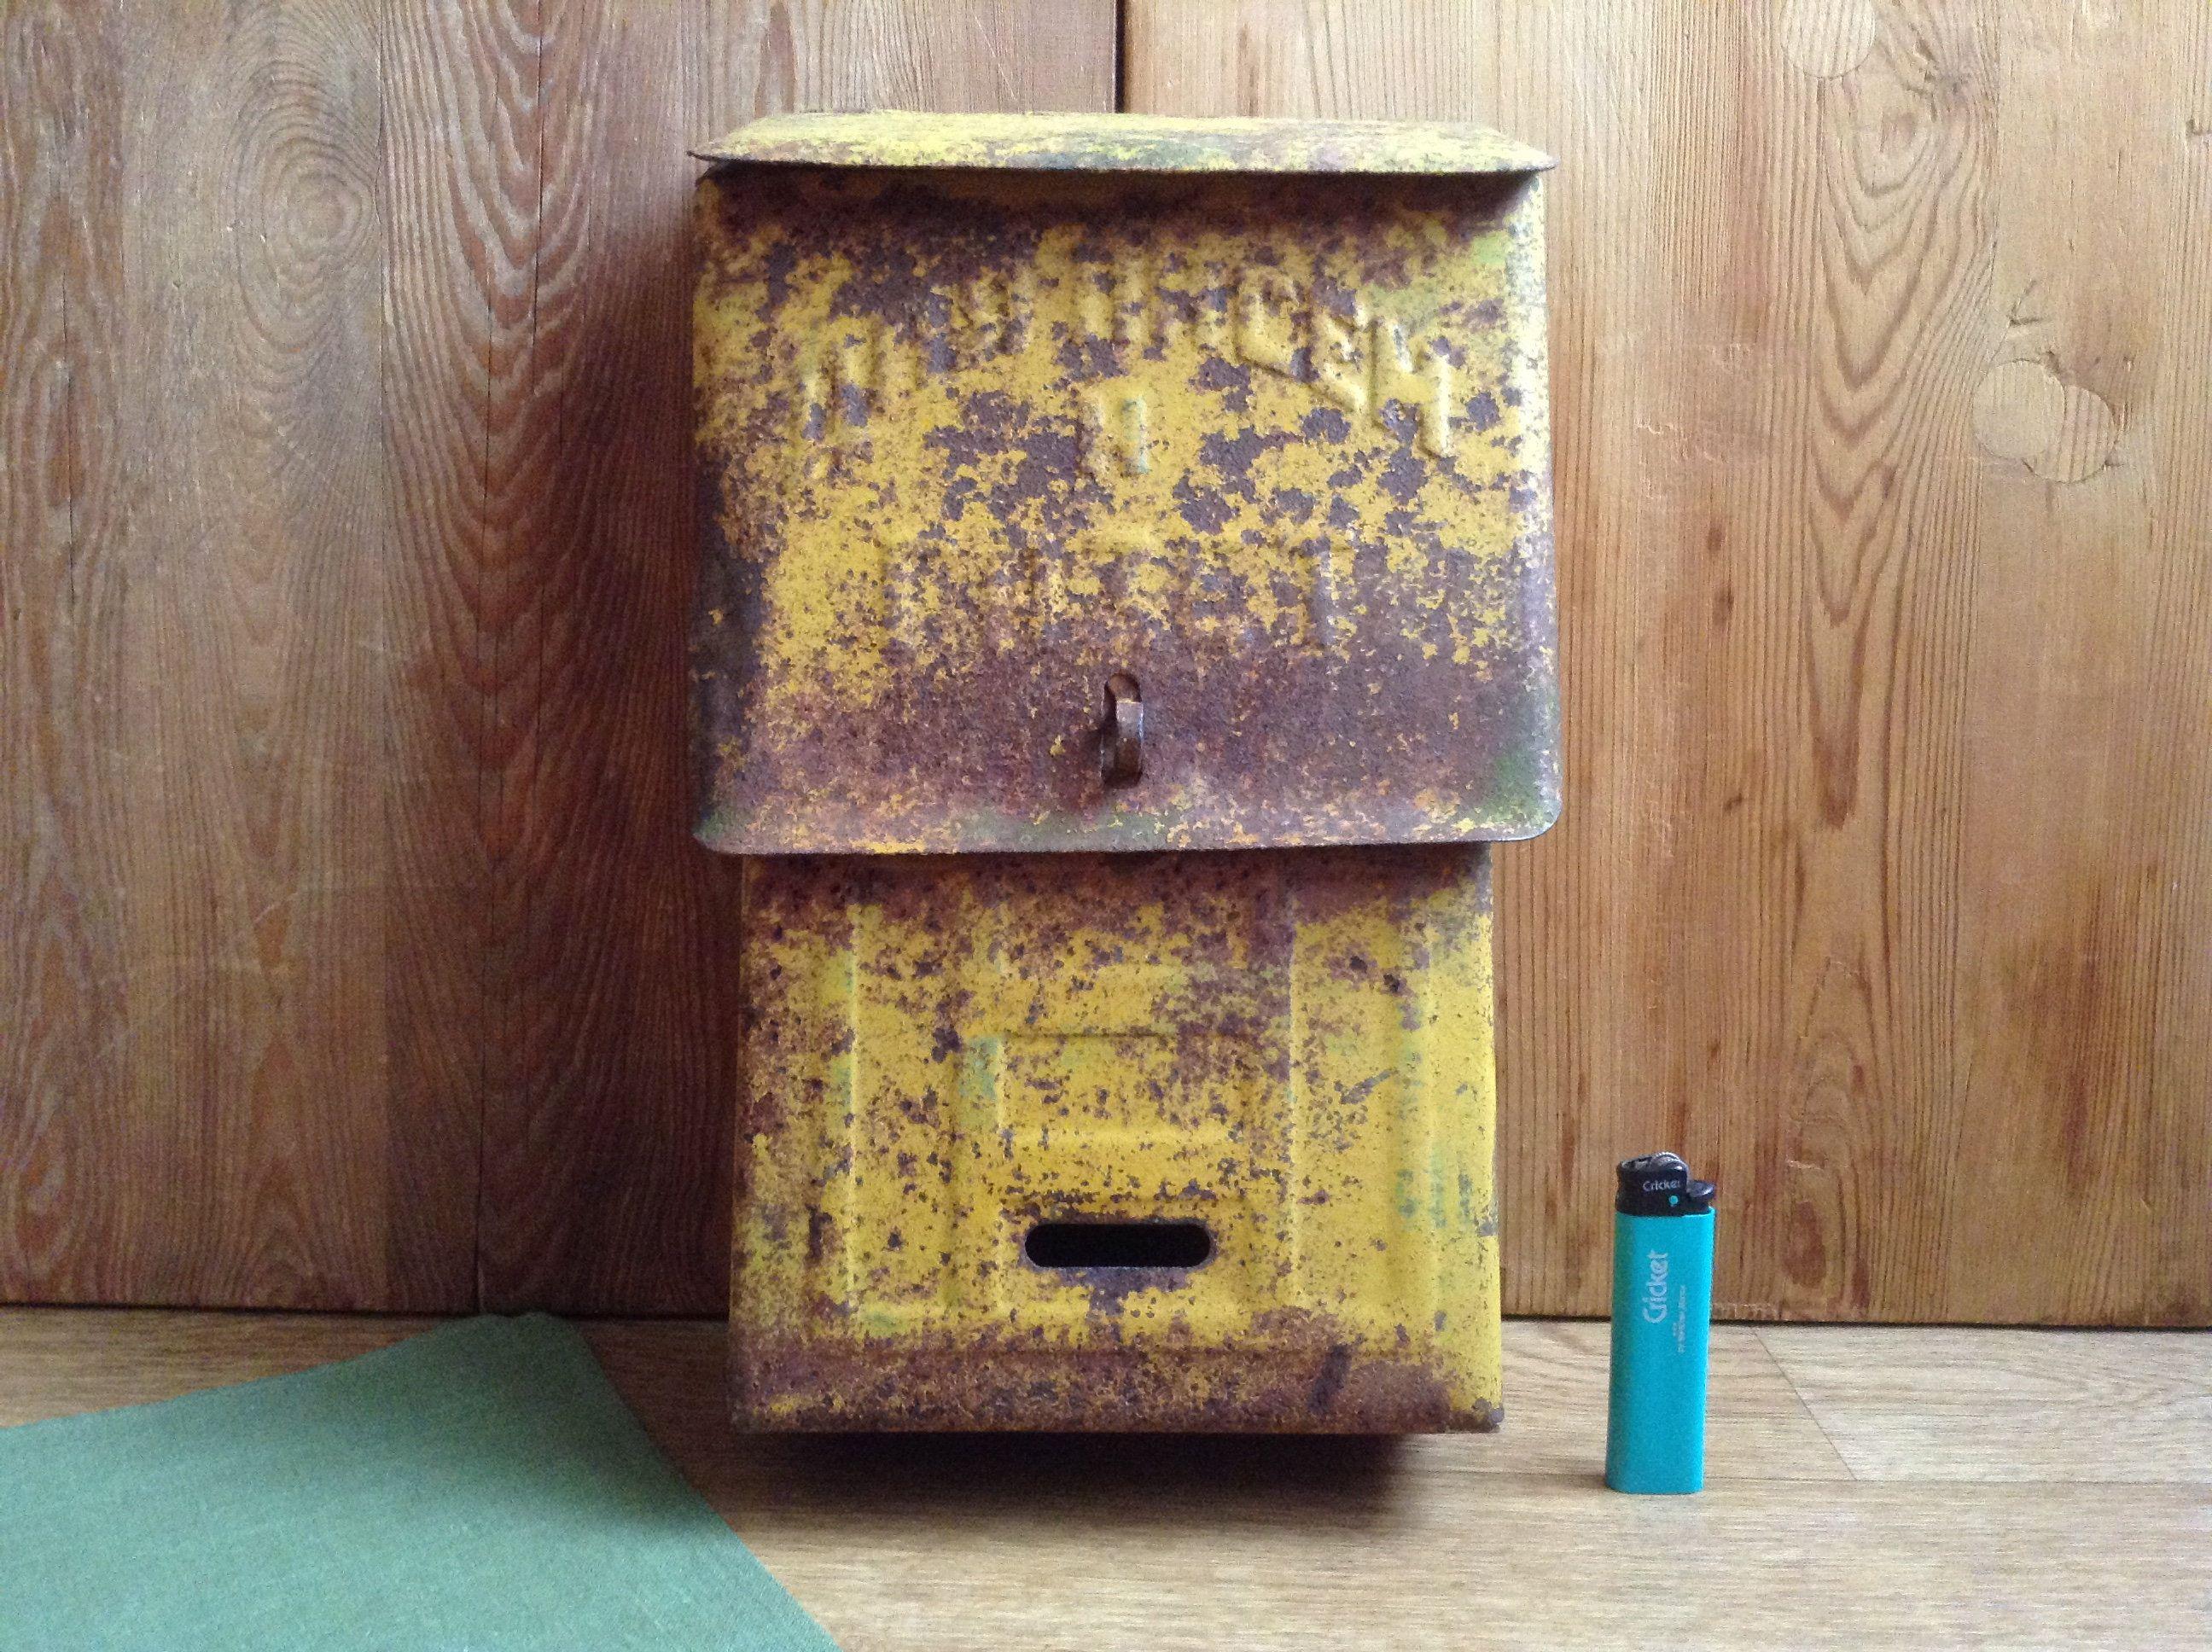 Vintage Bright Yellow Rusty Mailbox 60s Original Old Mailbox Locking Metal Letterbox Soviet Rustic Storage Metal Post Box Wedding Decor V 2020 G